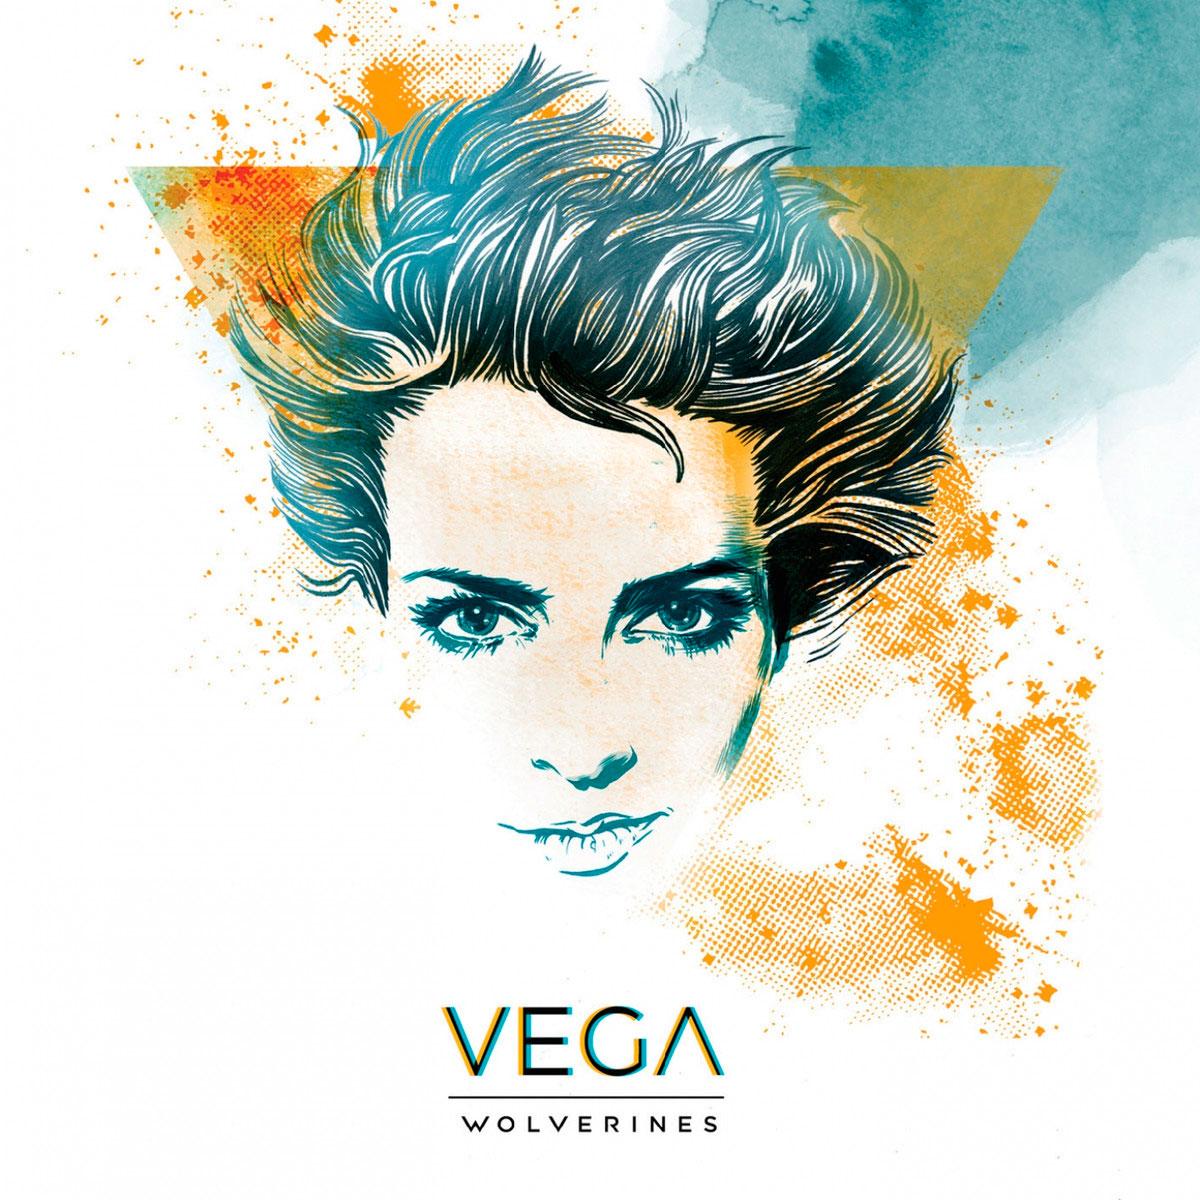 vega_wolverines-portada.jpg